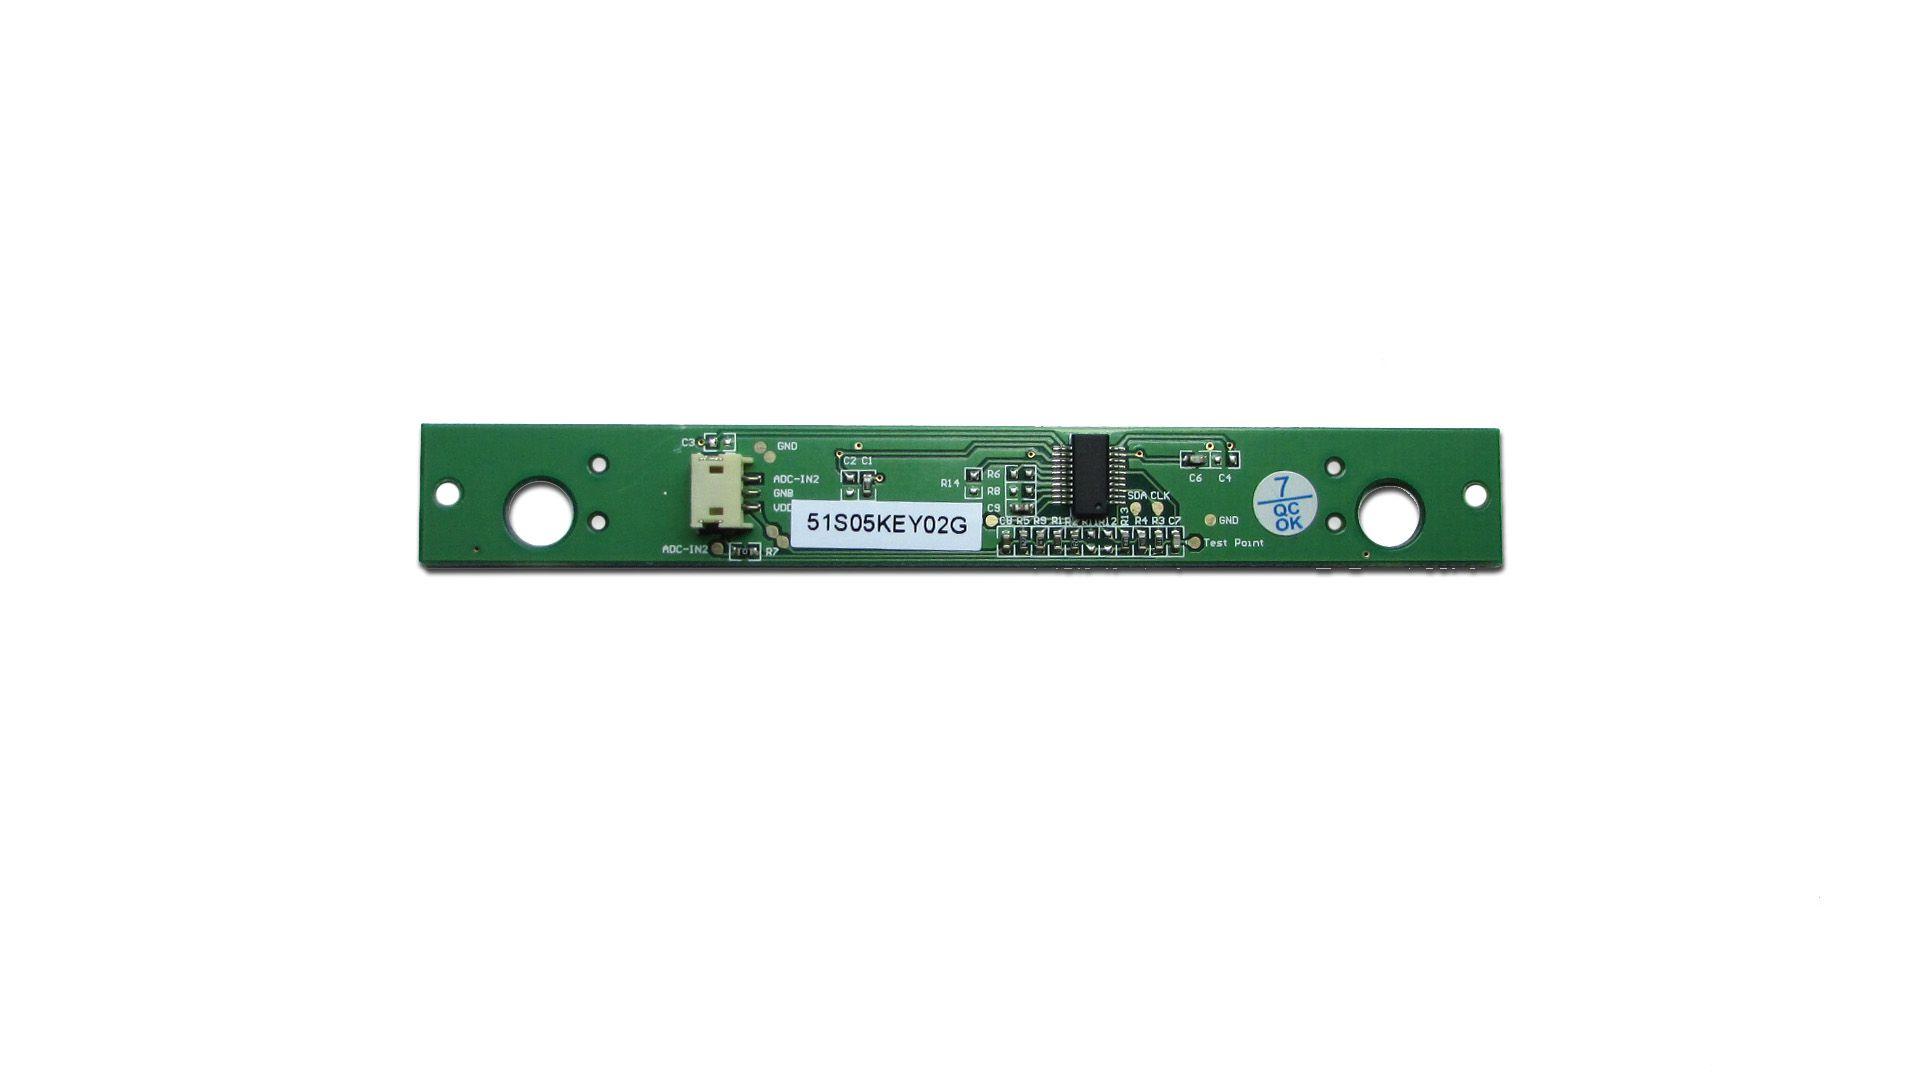 Placa Teclado Funções St-osd-5key-162-11 - Monitor Positivo